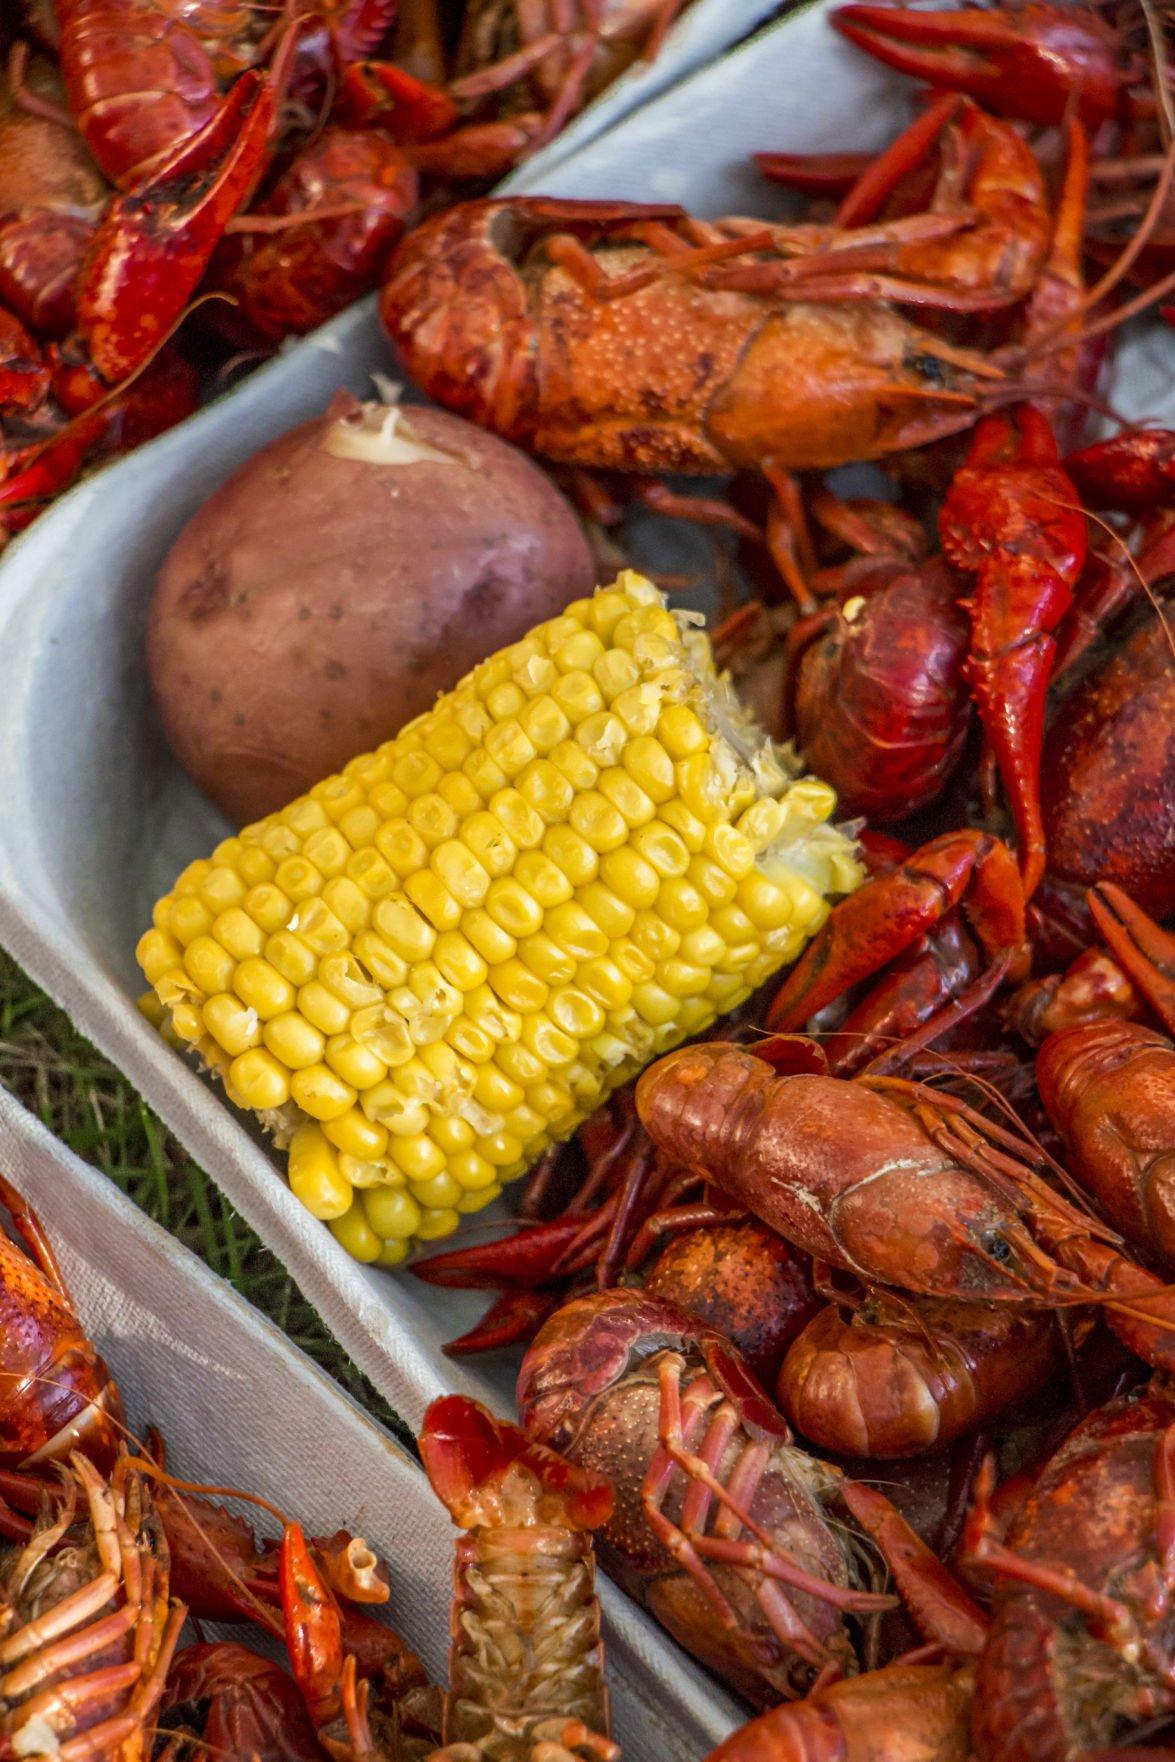 4-12-18 Crawfish Boil